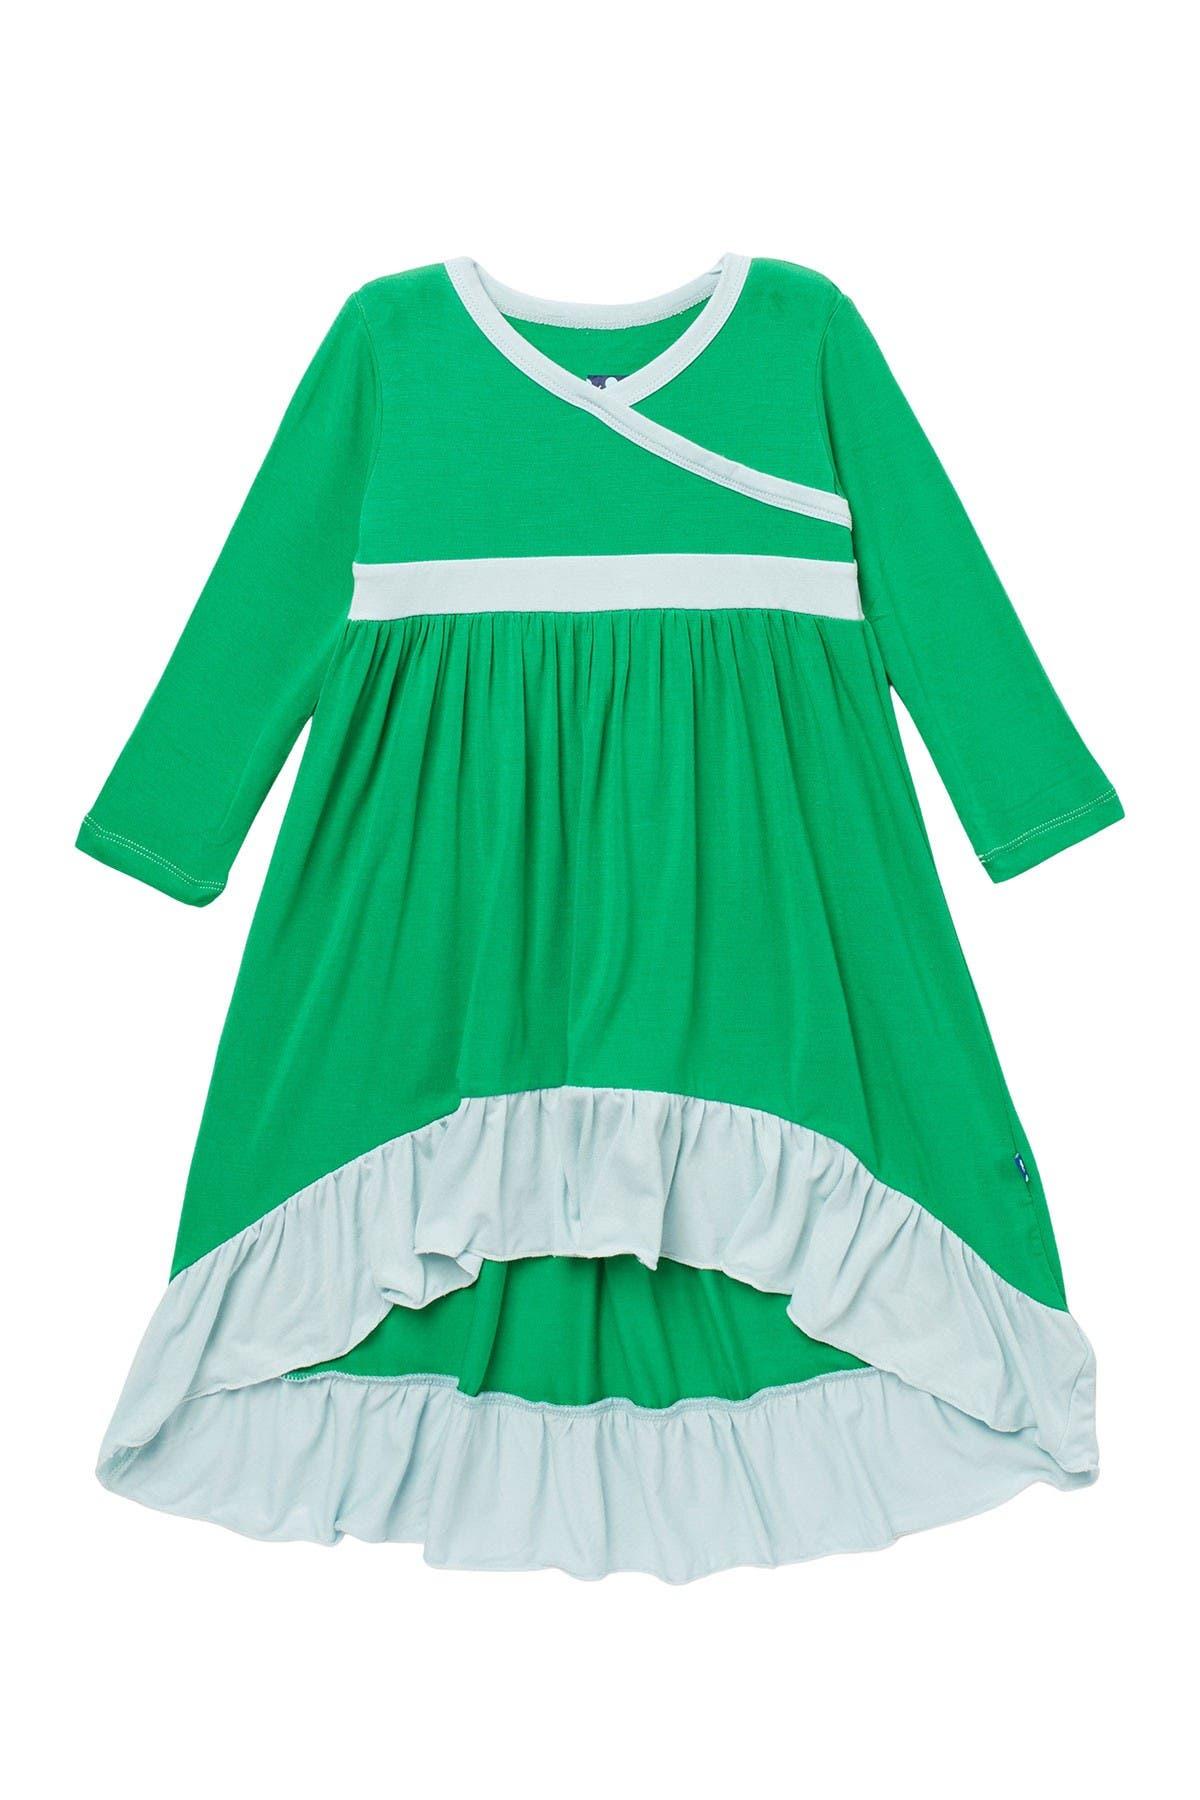 Image of KicKee Pants High/Low Contrast Trim Dress